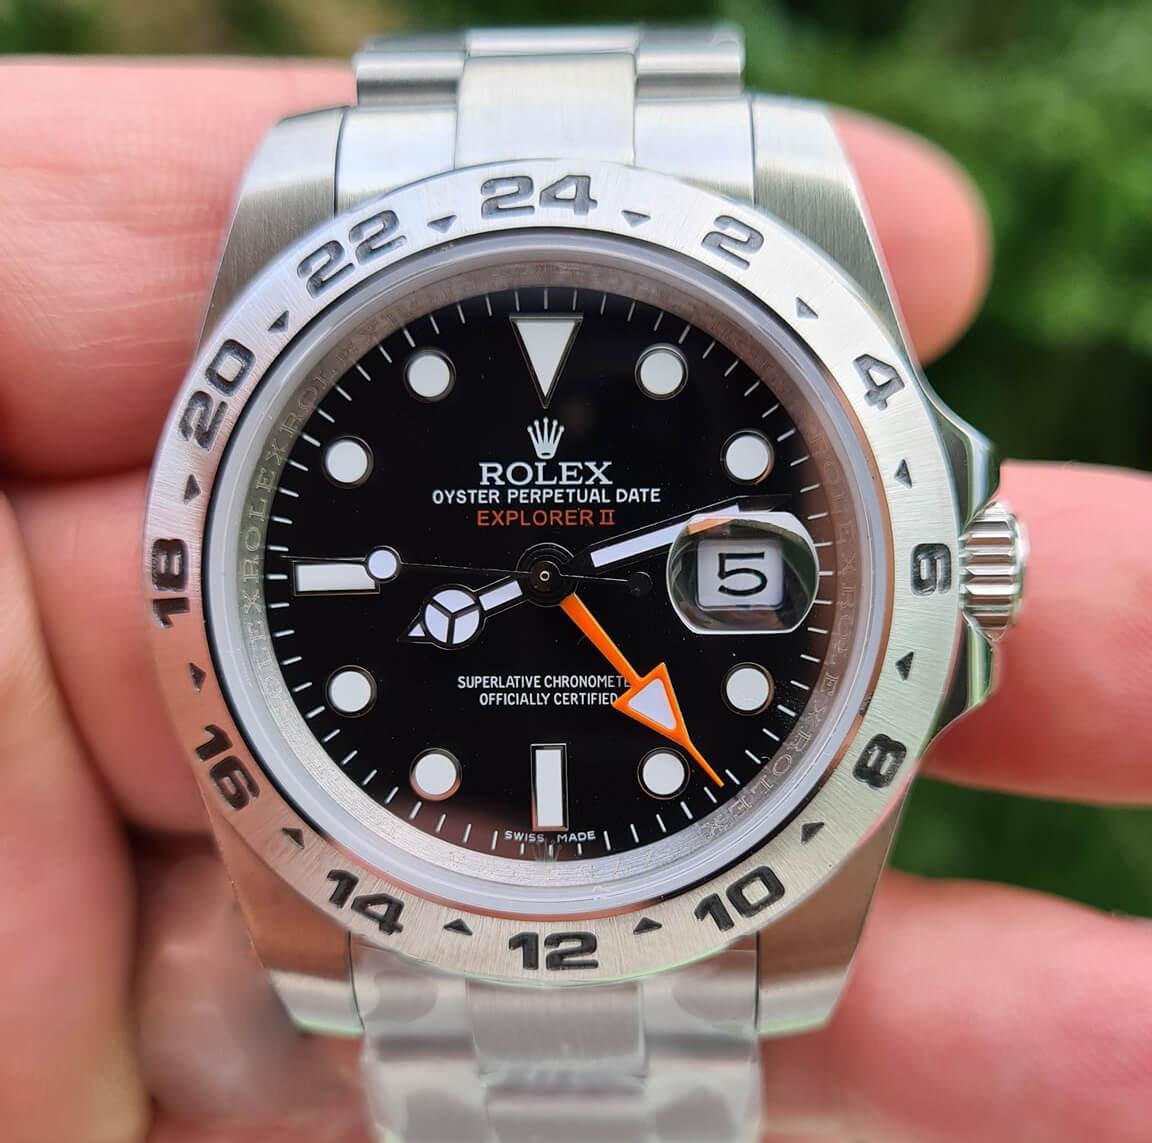 Rolex Explorer II Fake